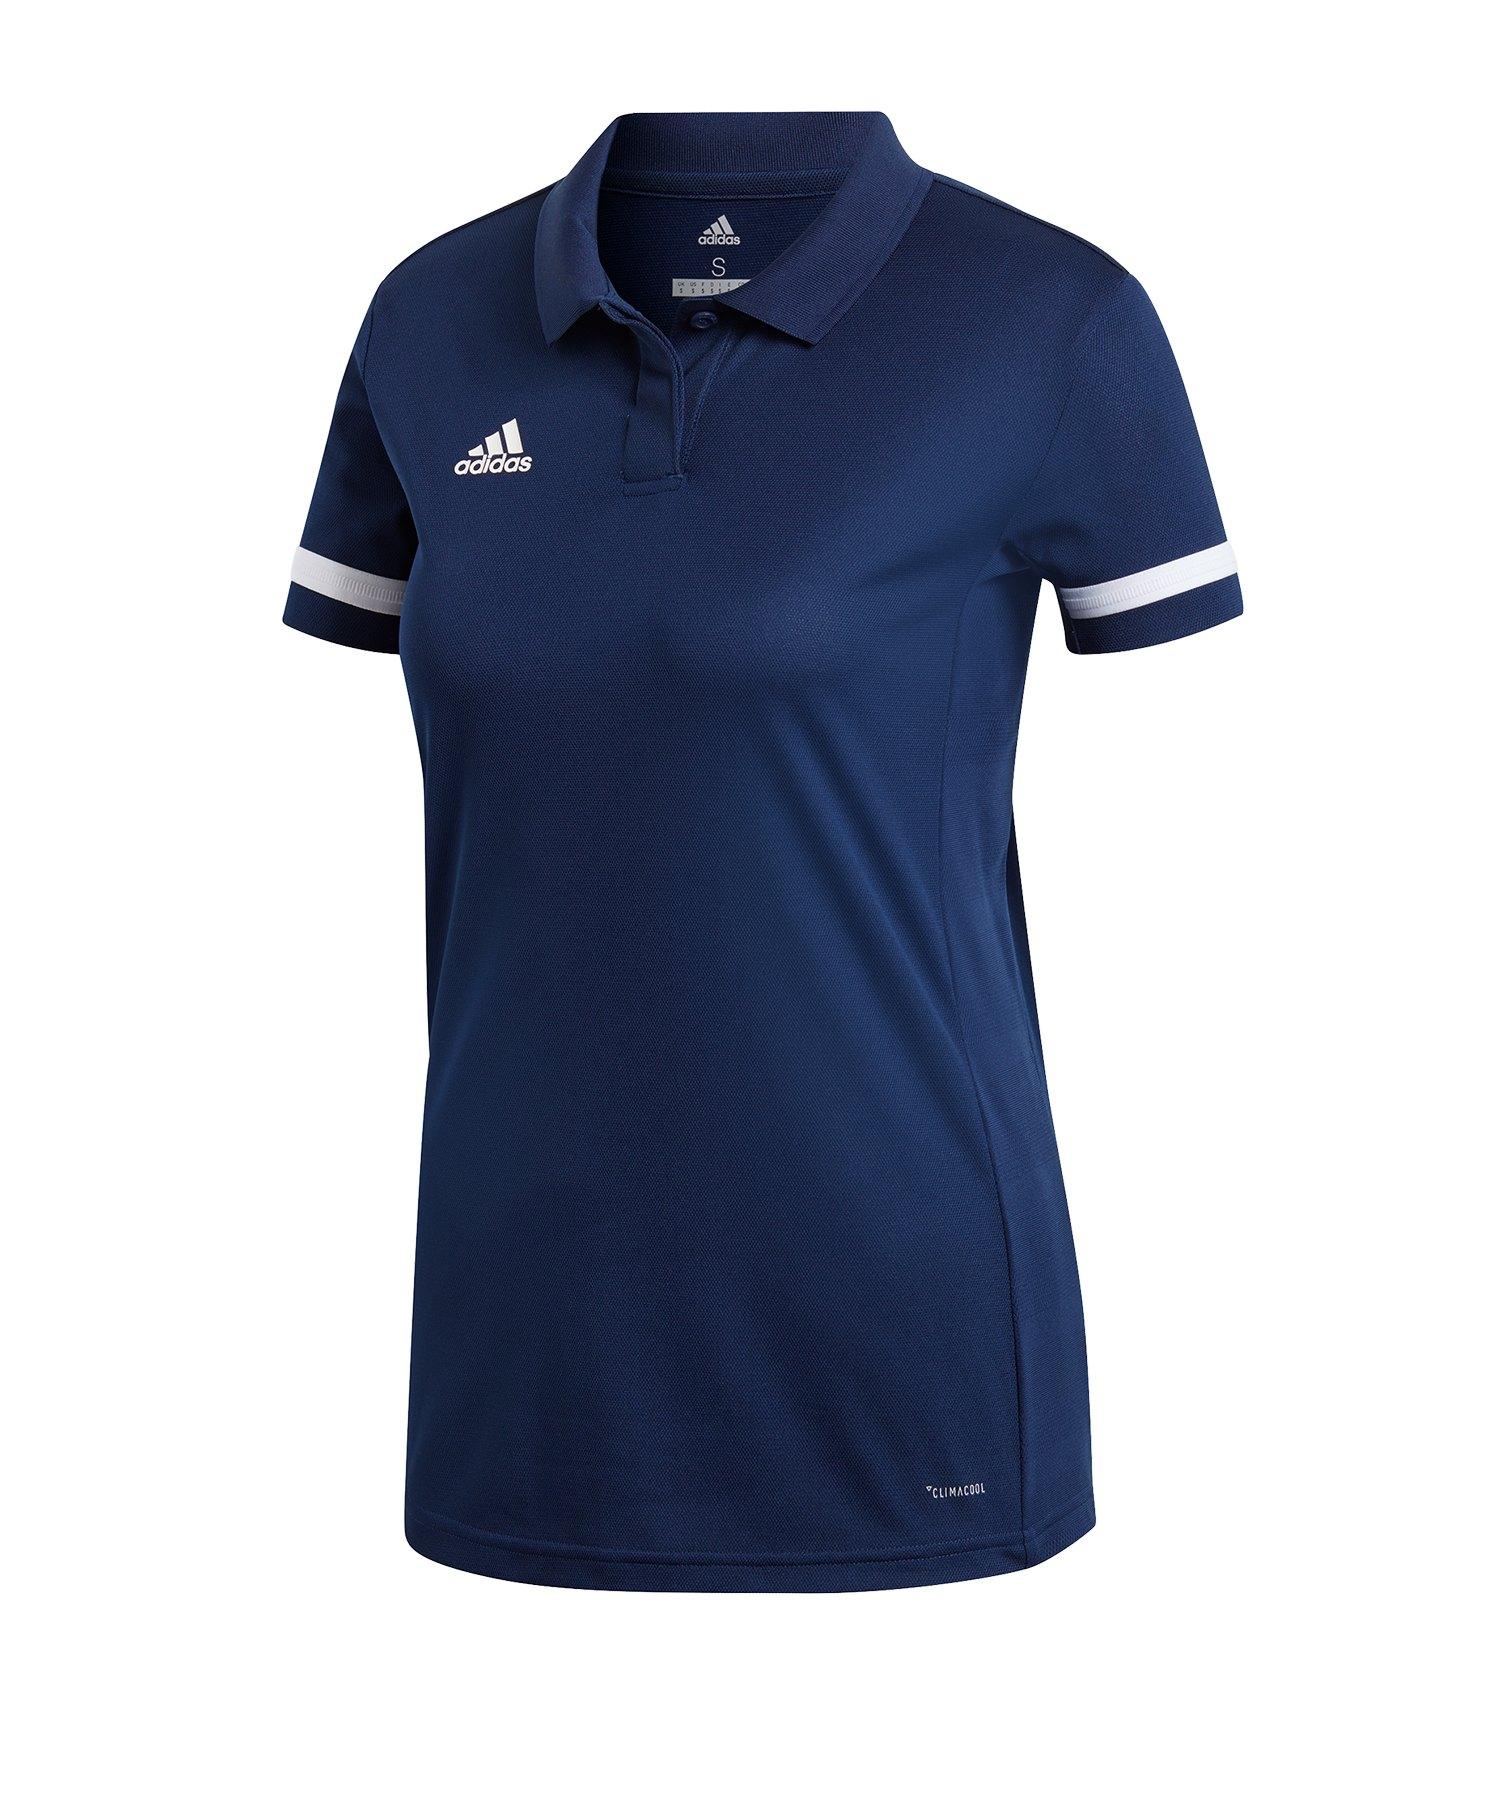 adidas Team 19 Poloshirt Damen Blau Weiss